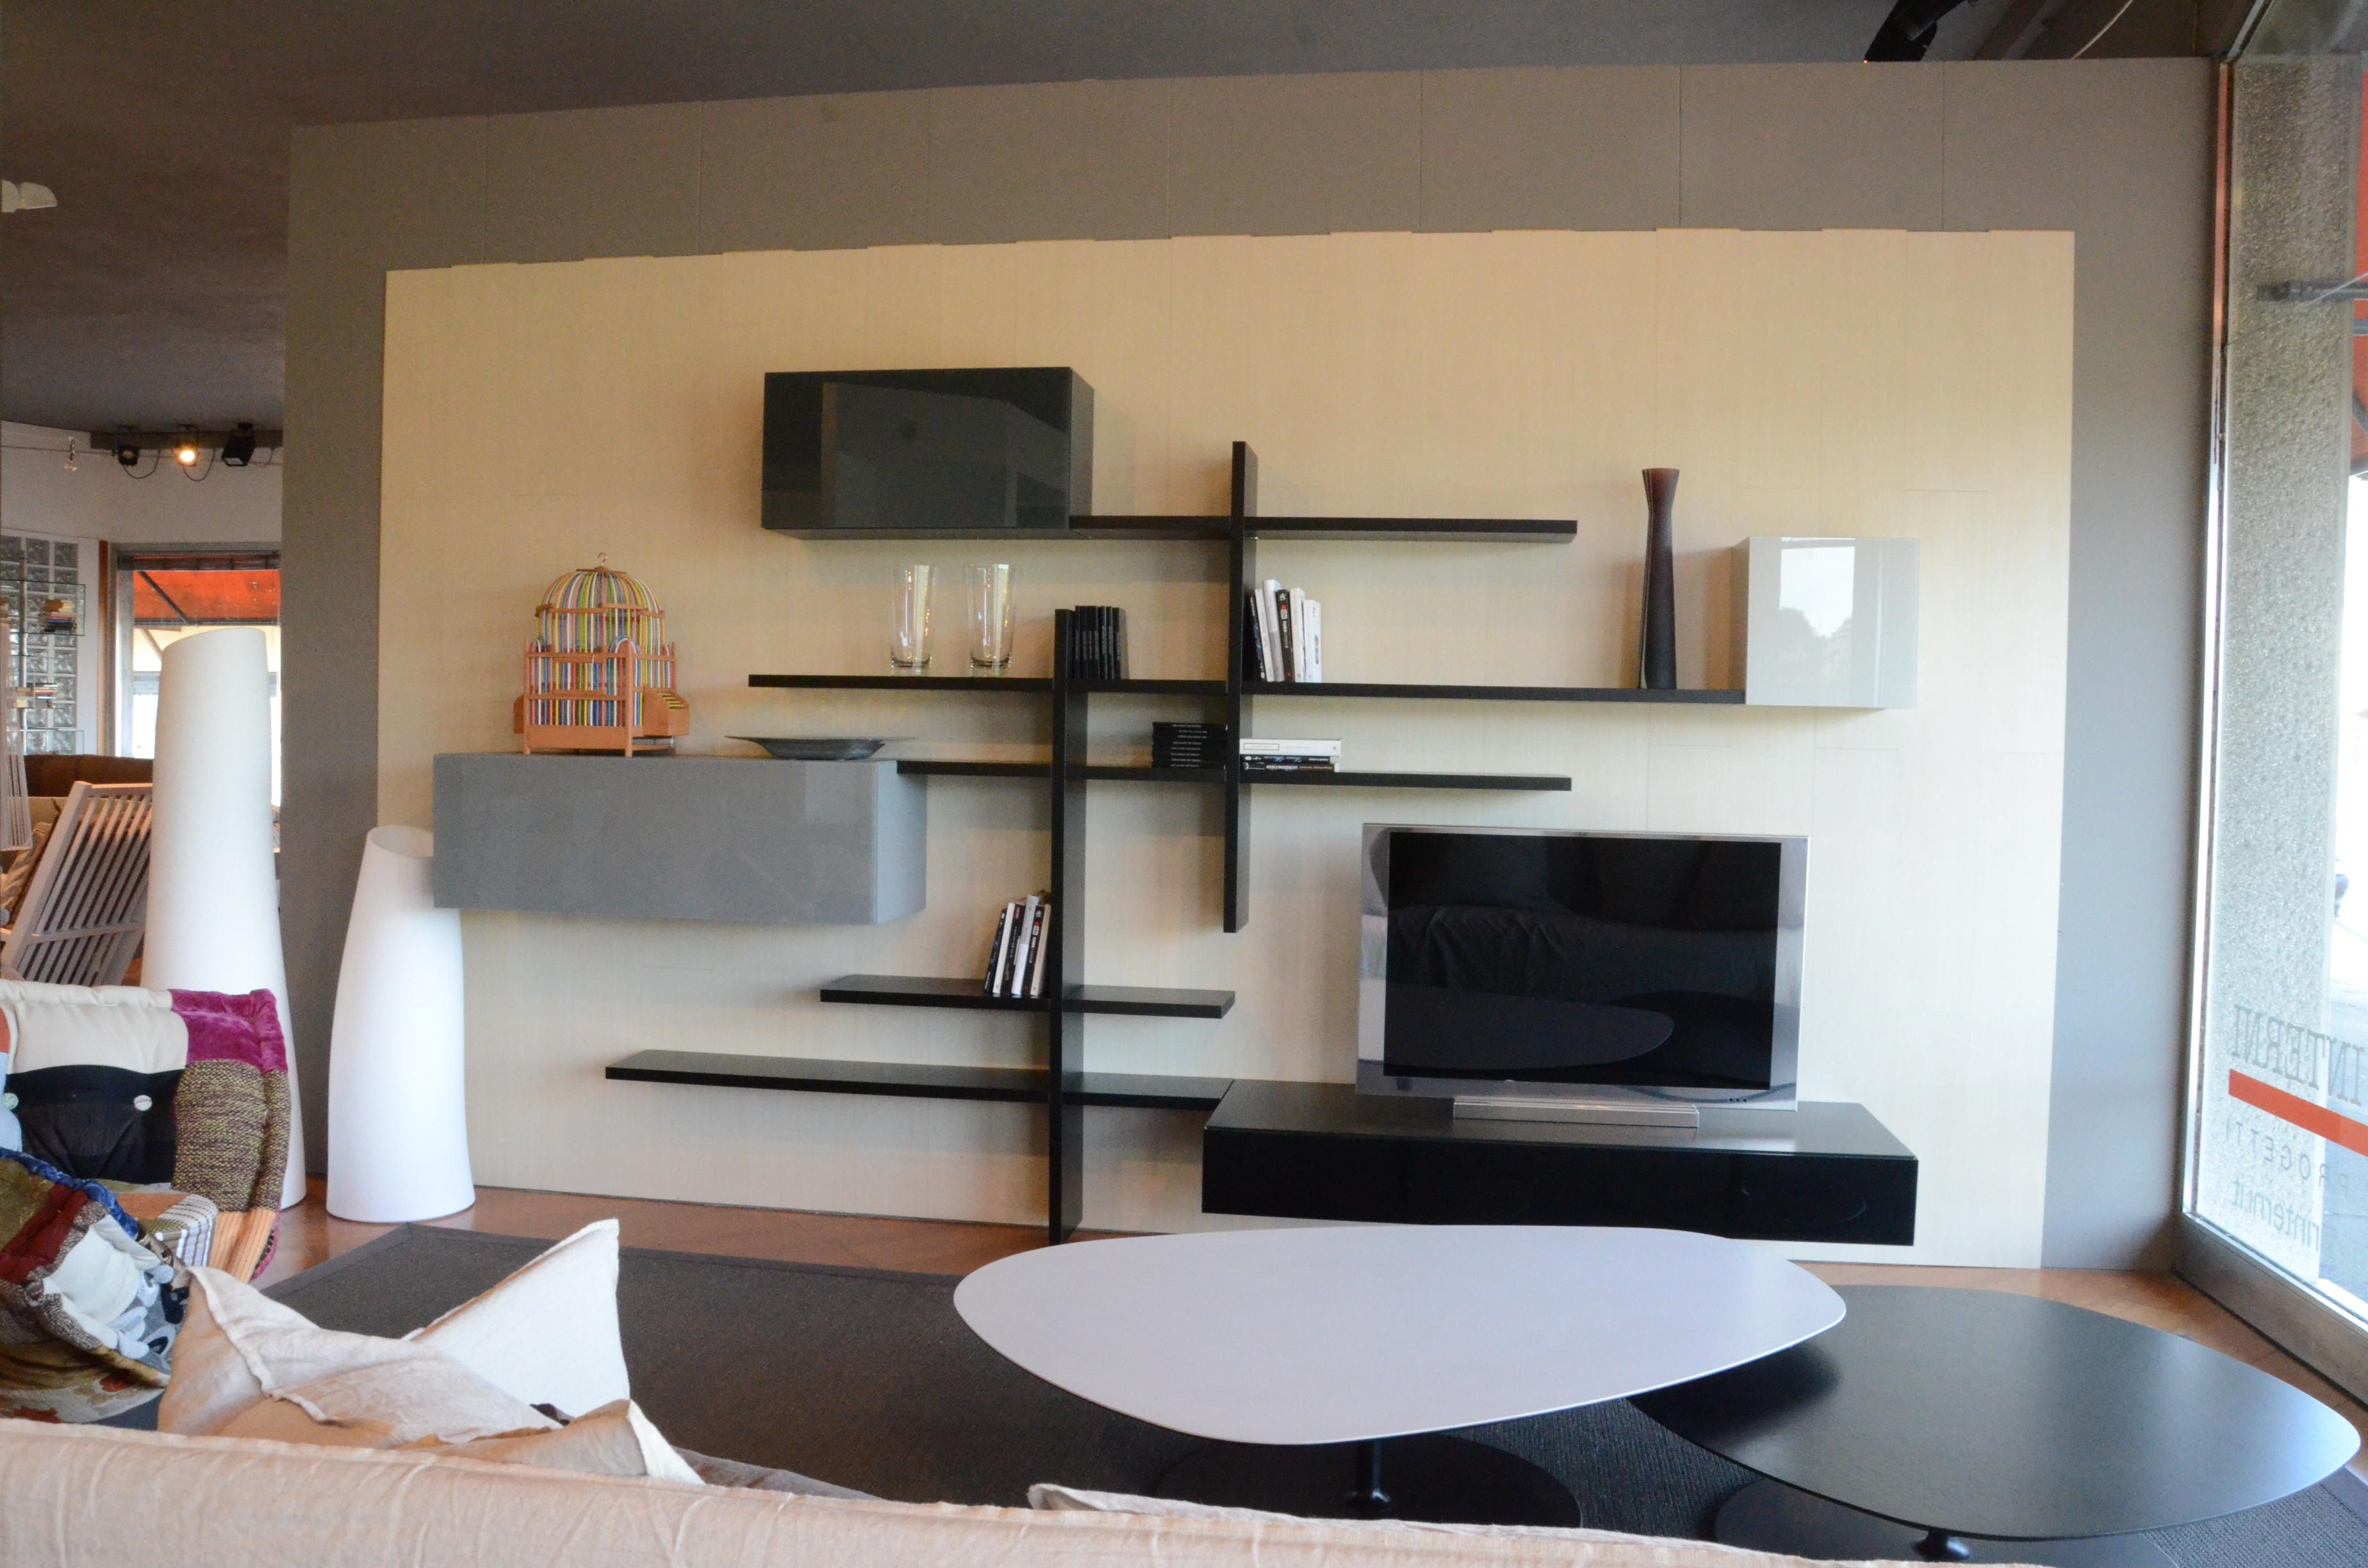 Mobili ingresso lago mobili per soggiorno moderni l for Mobili cattelan prezzi